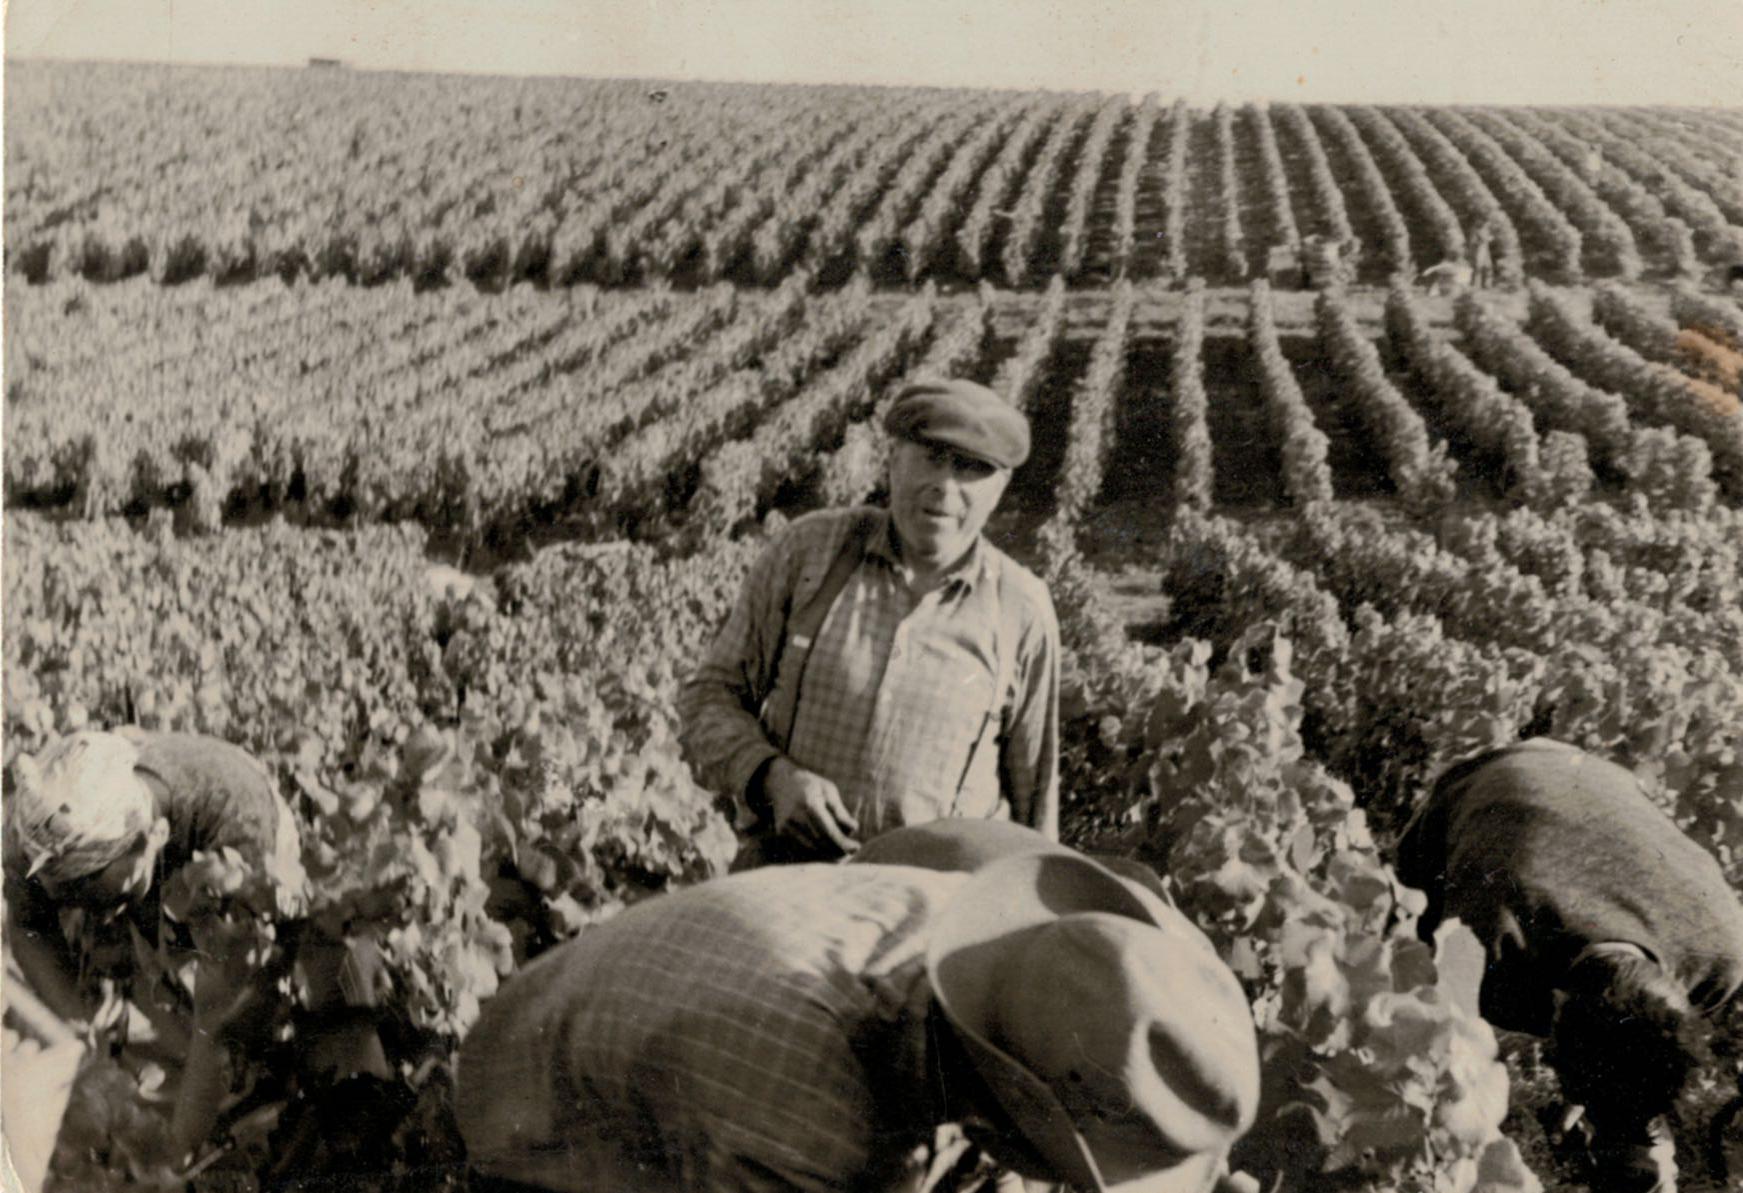 Historique du Champagne Francois Girard